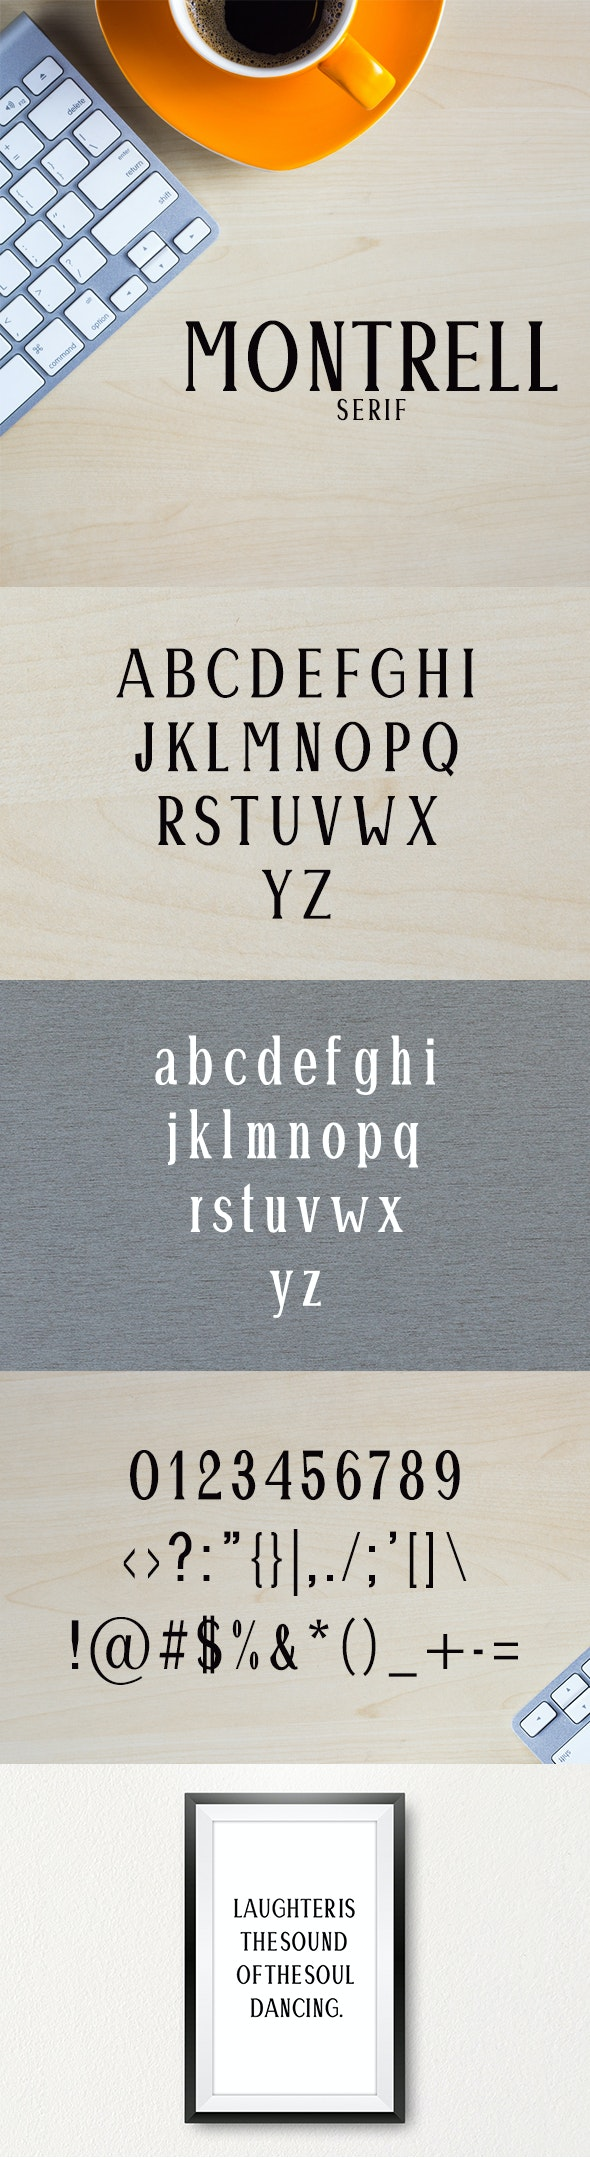 Montrell Serif Typeface - Serif Fonts